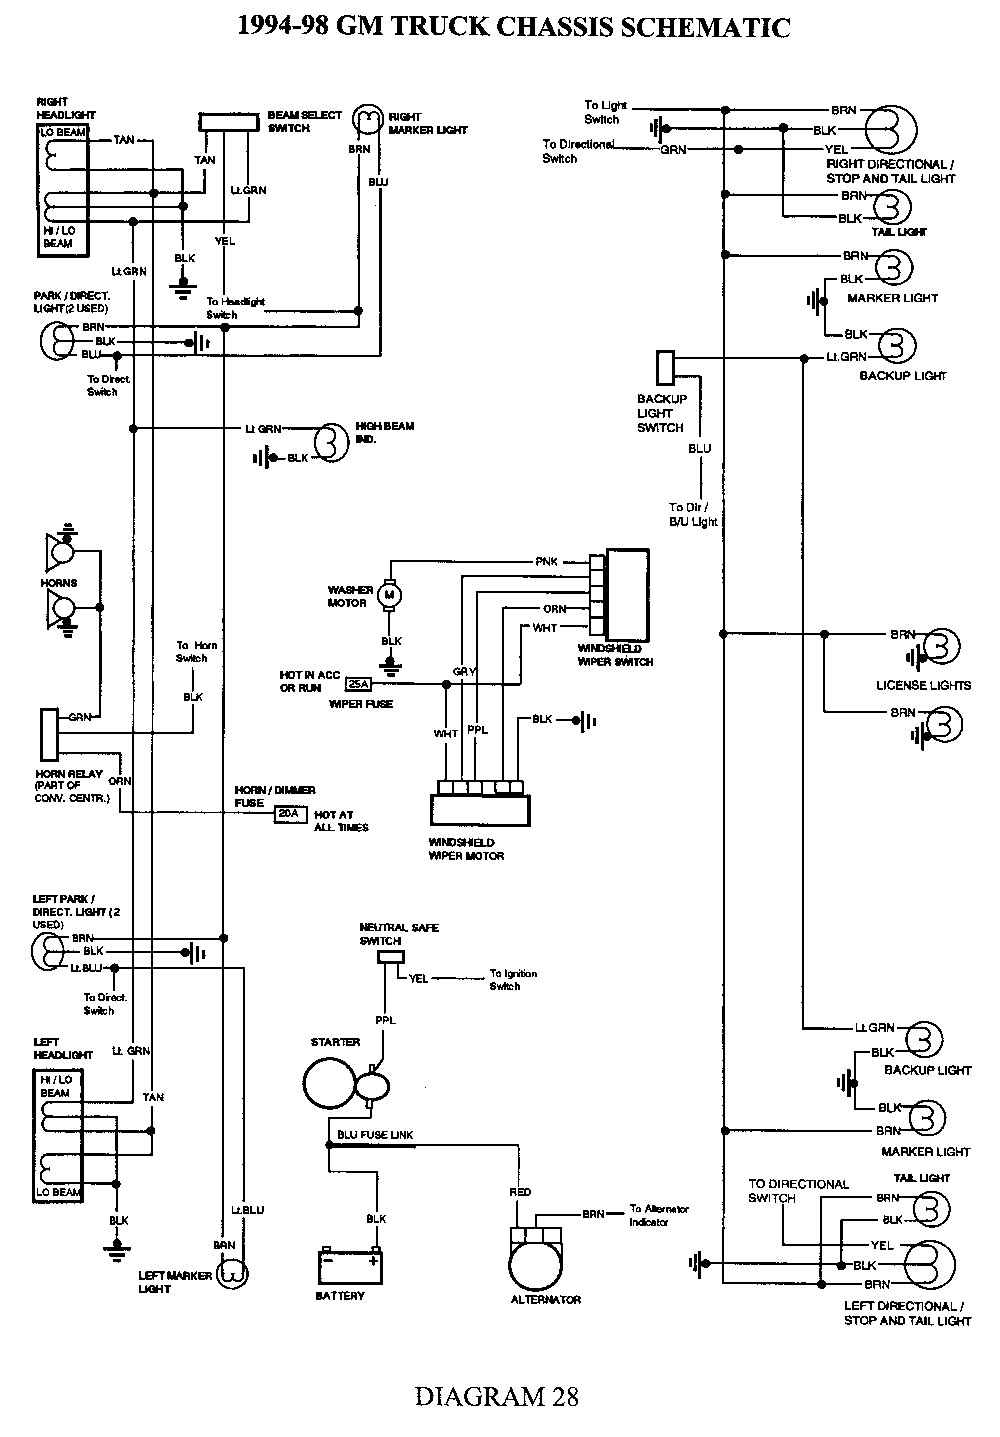 isuzu d max wiring diagram pdf